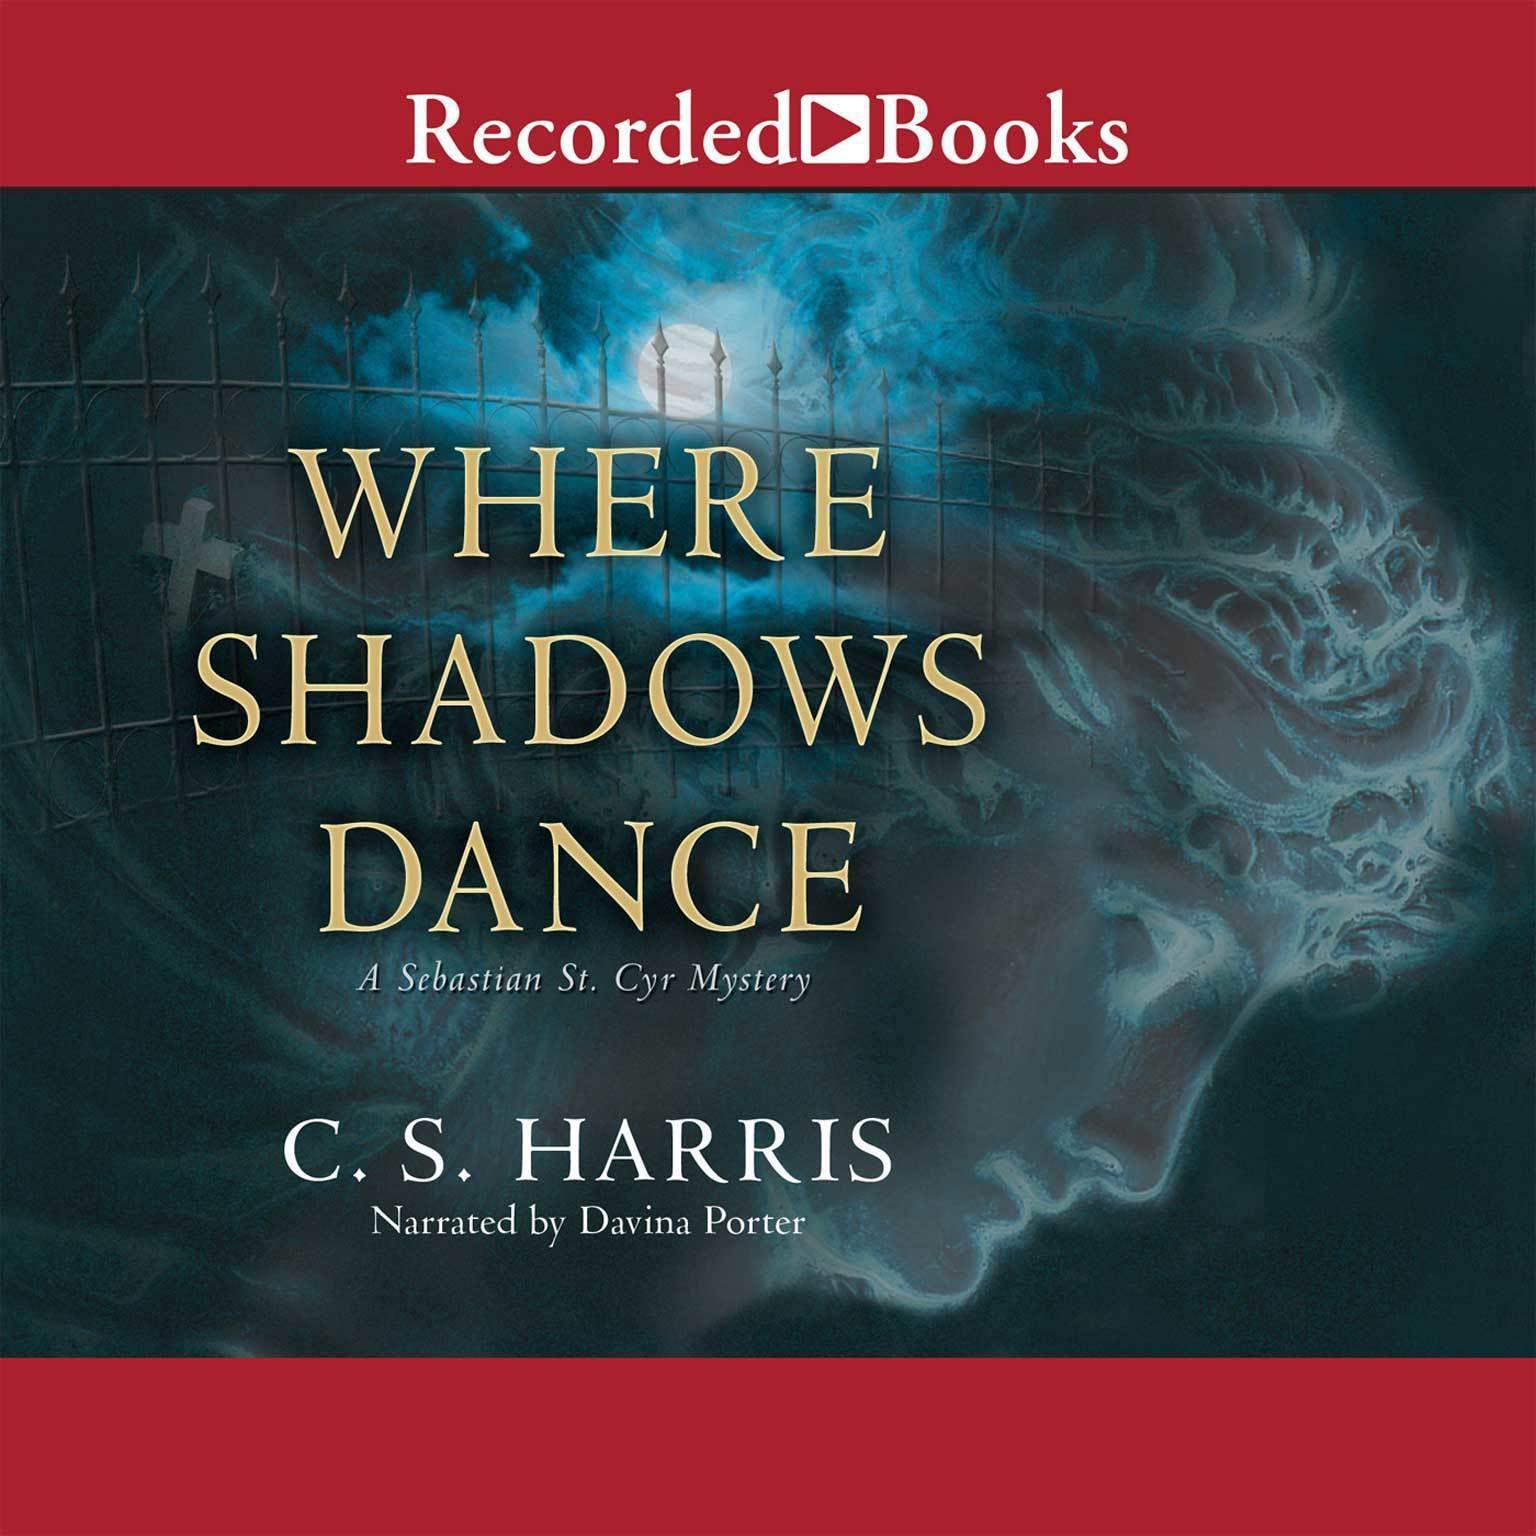 Where Shadows Dance Audiobook, by C. S. Harris